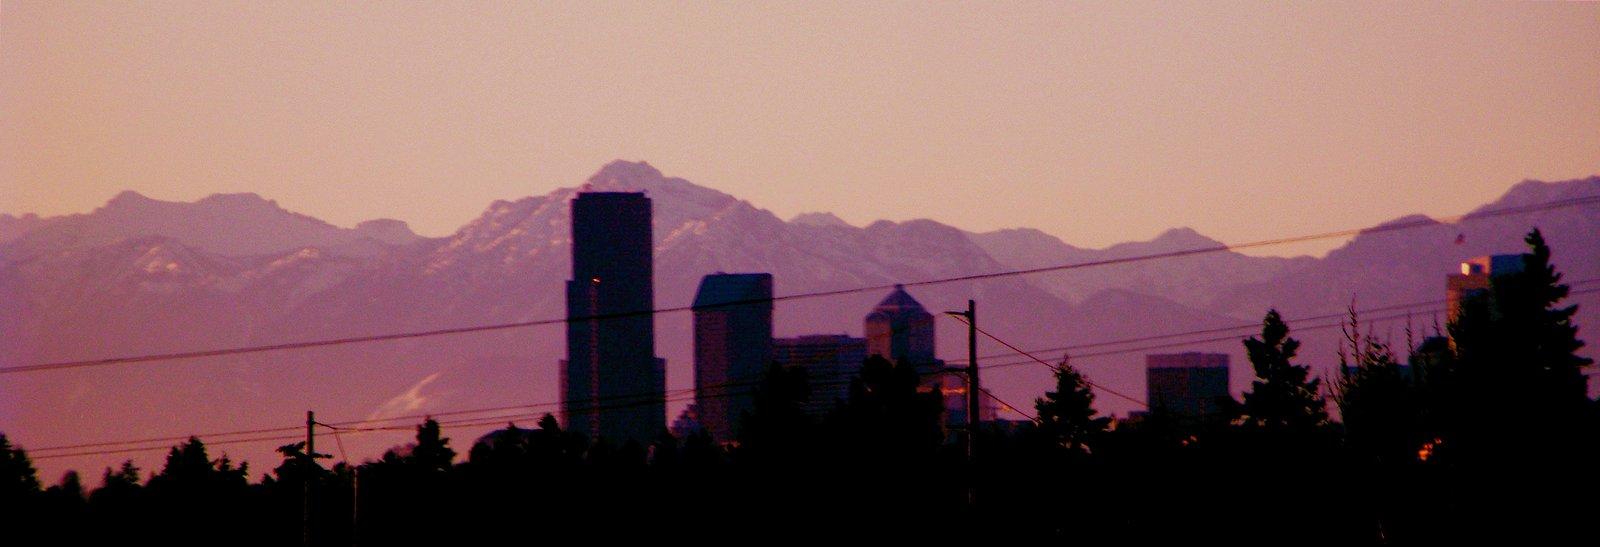 Seattle skyline against mountains